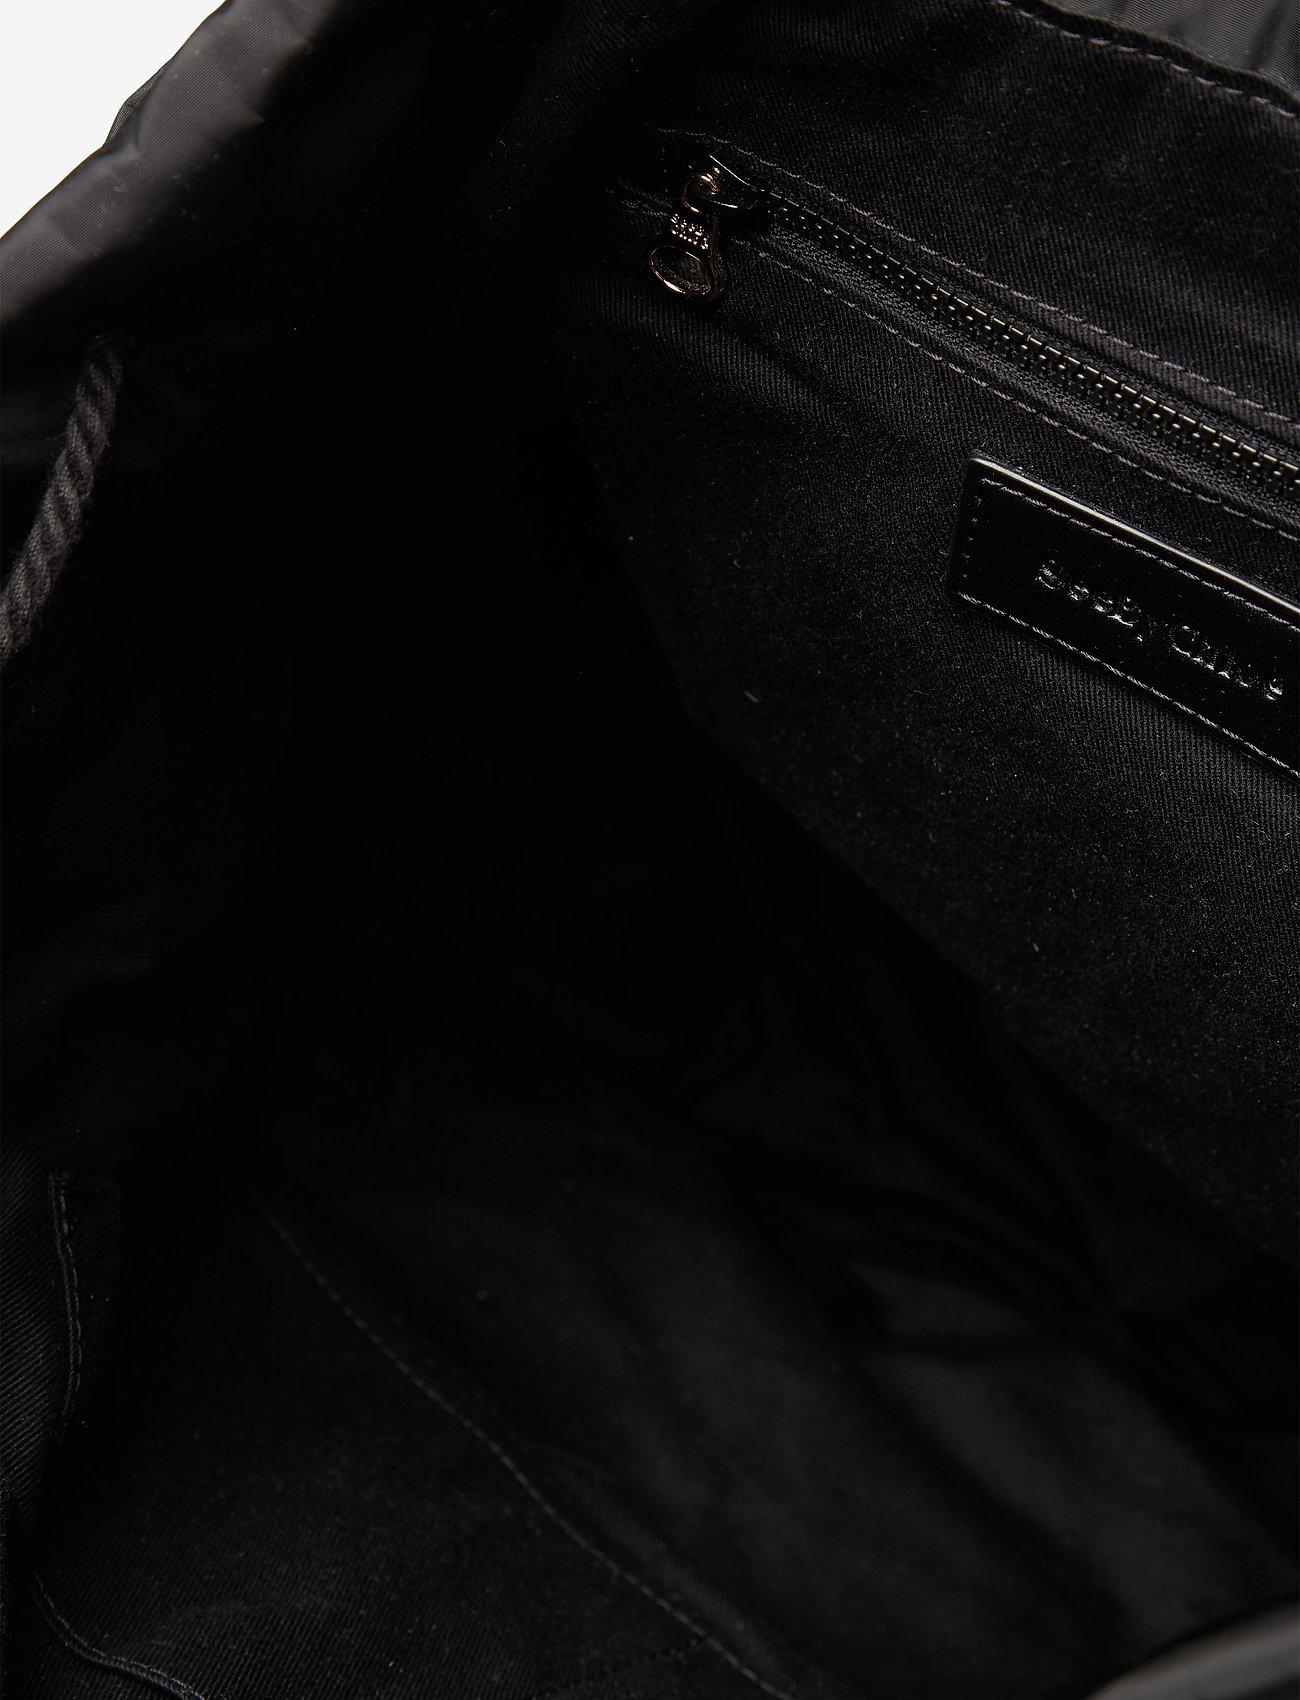 See by Chloé - JOY RIDER - tassen - black - 4